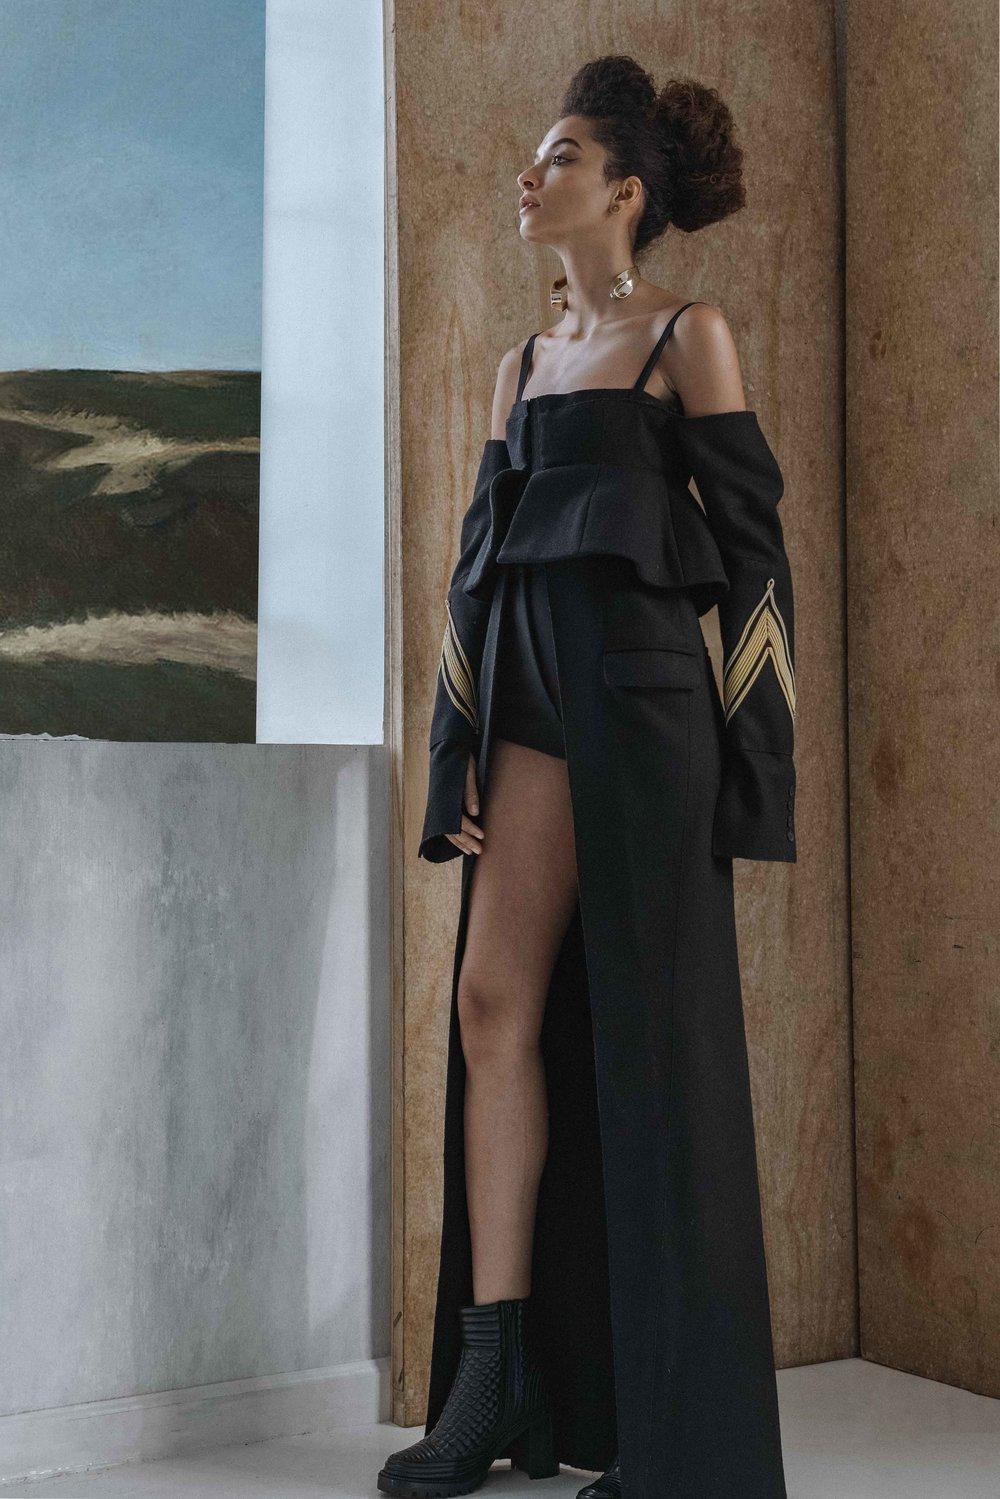 Vera+Wang_Ping+Wang+Bazaar China